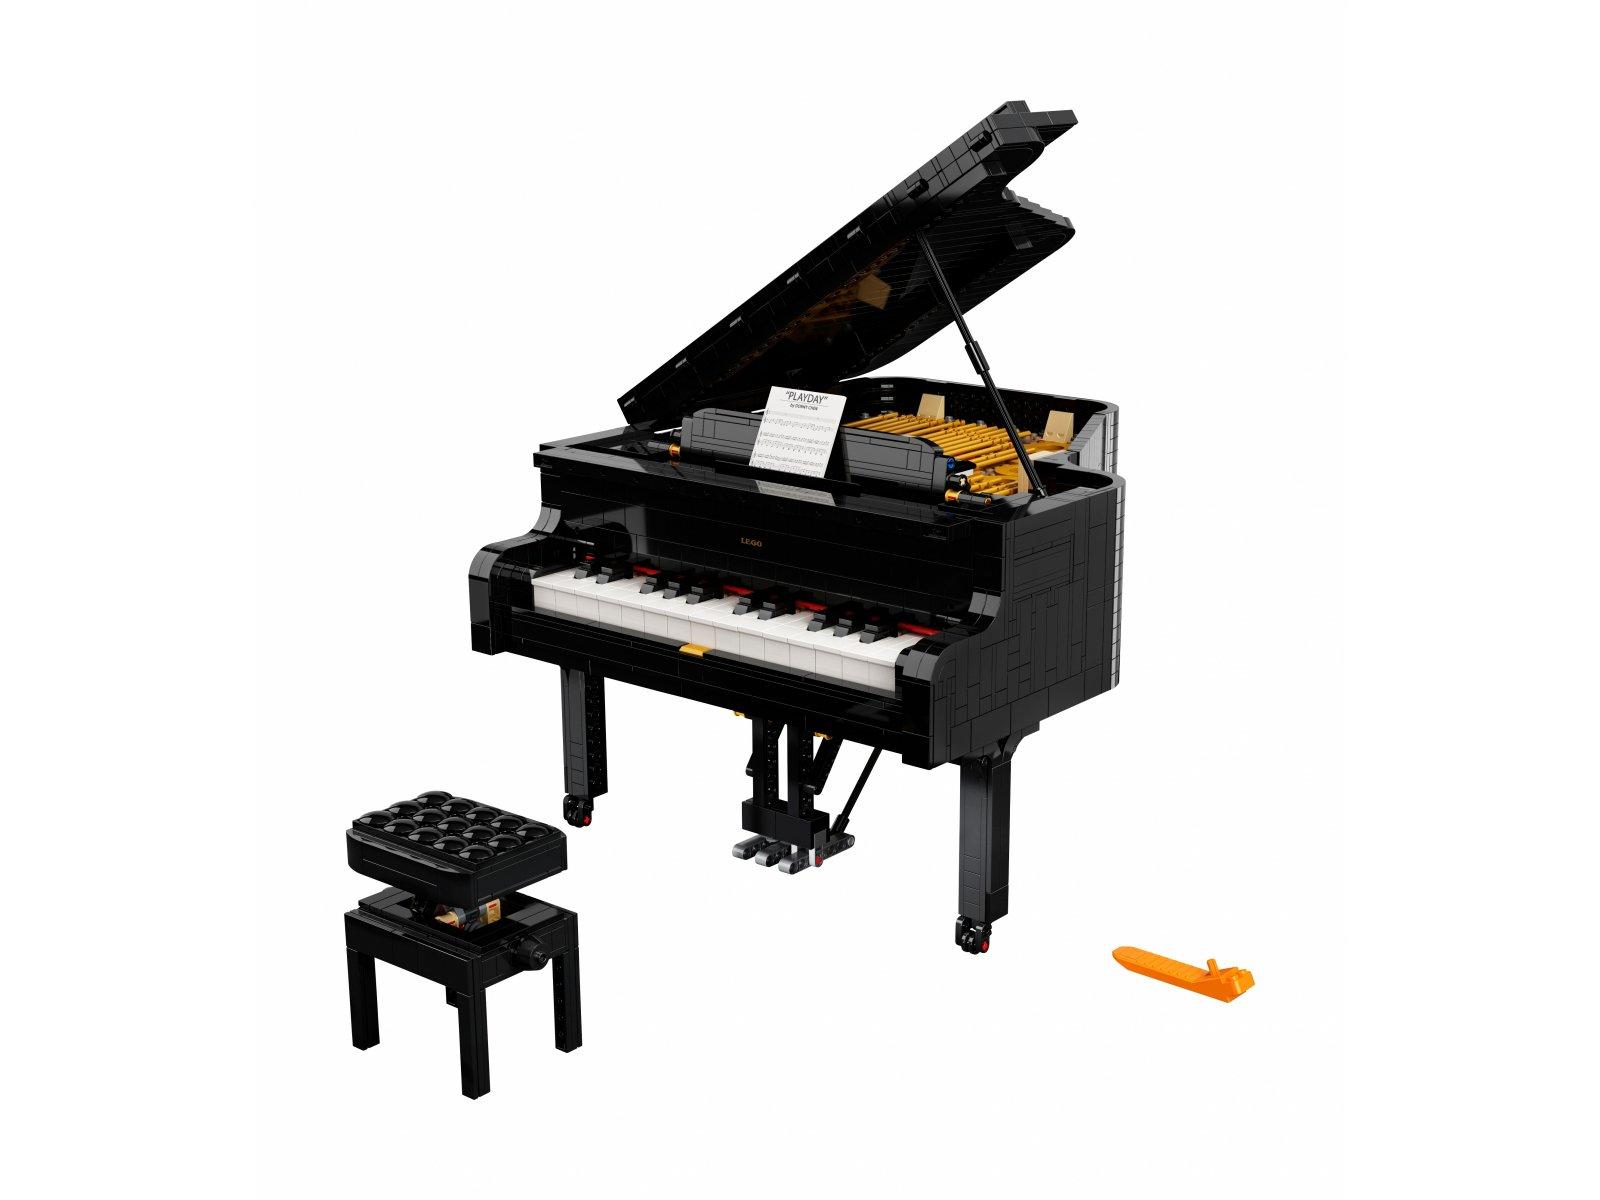 LEGO Ideas Fortepian 21323